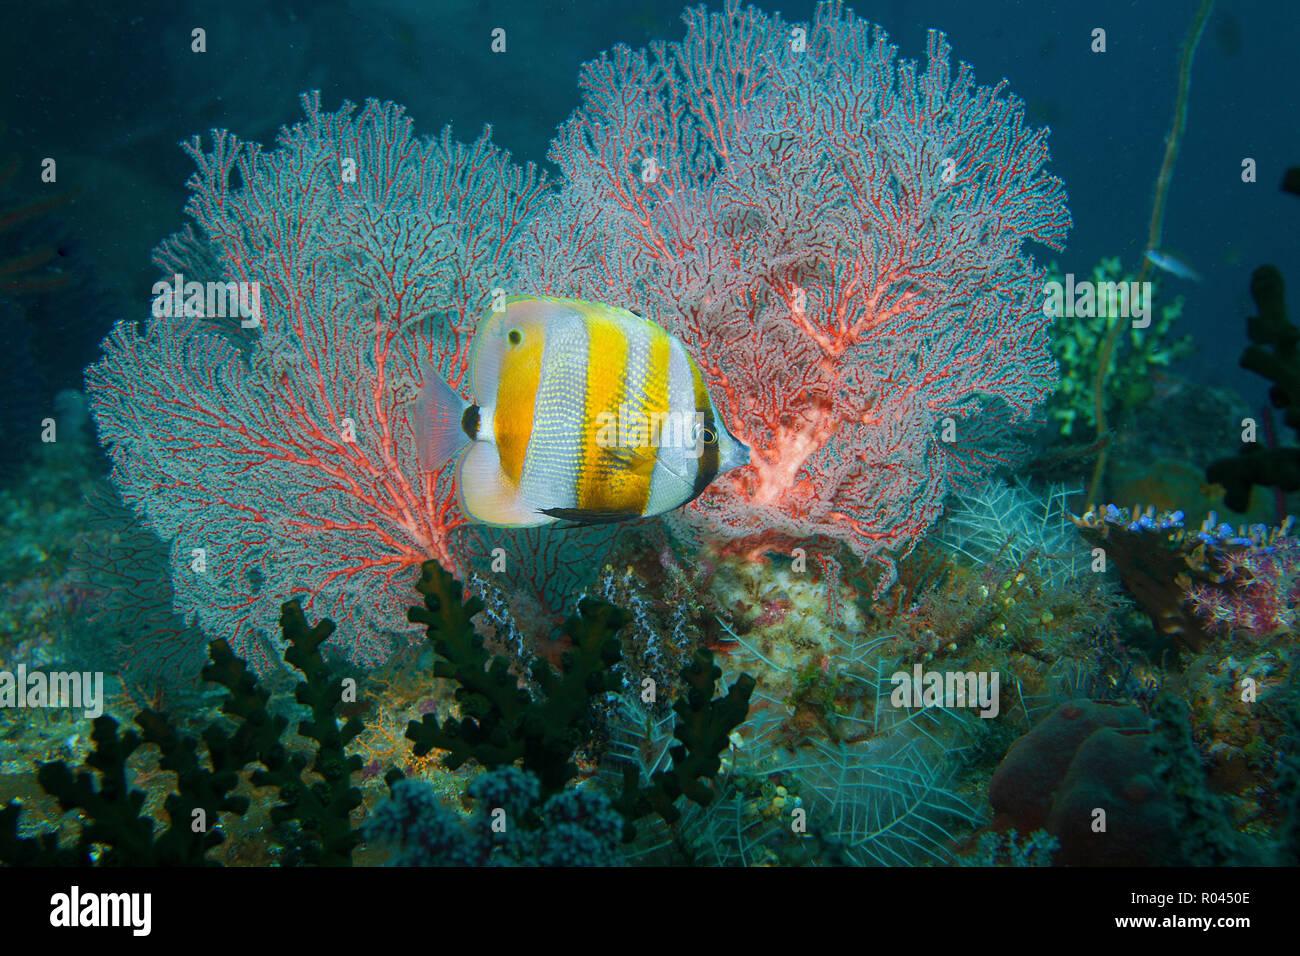 Orange-banded coralfish (Coradion chrysozonus) at a seafan, Raja Ampat, Irian Jaya, Indonesia - Stock Image